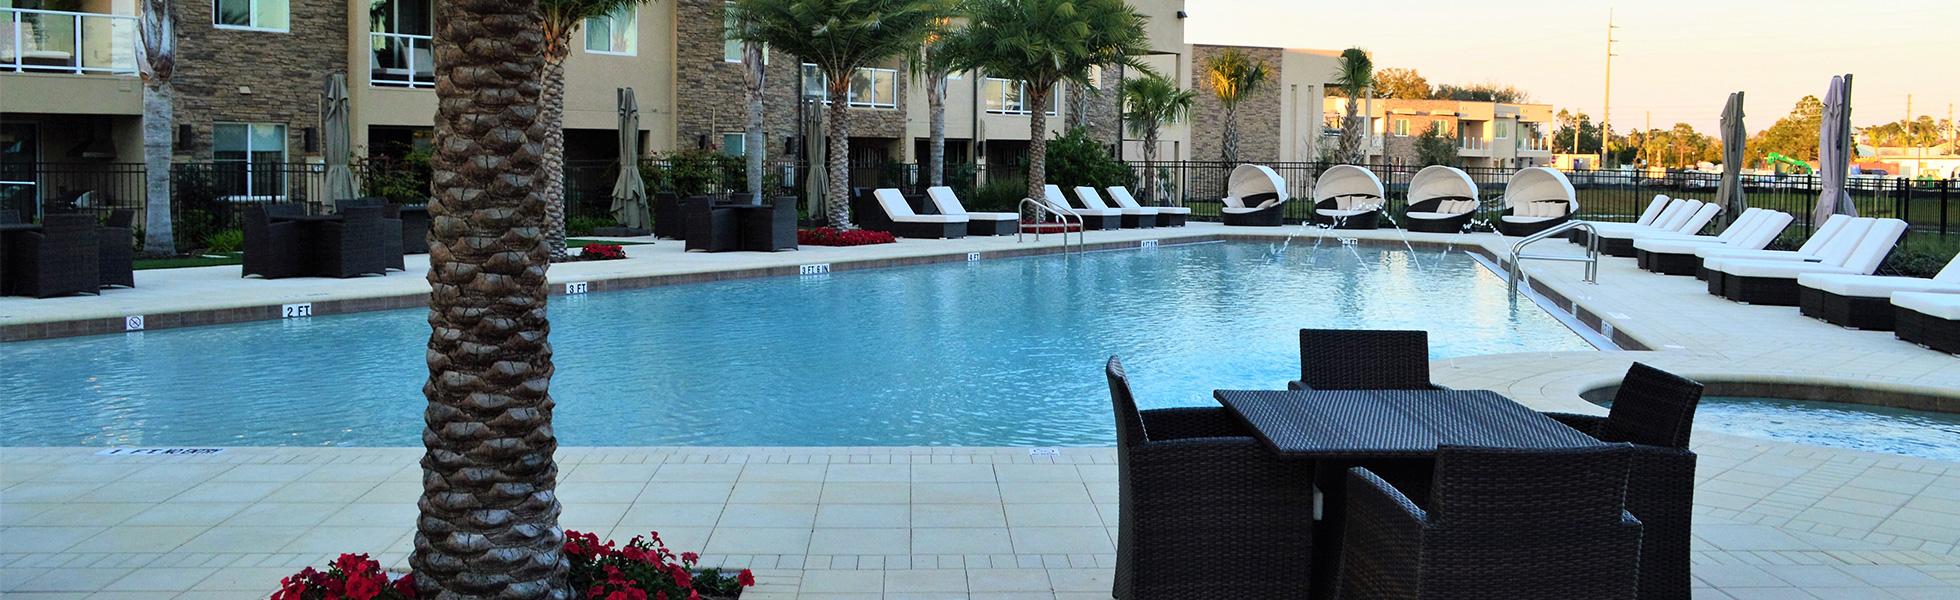 Orlando Commercial Pool Builder